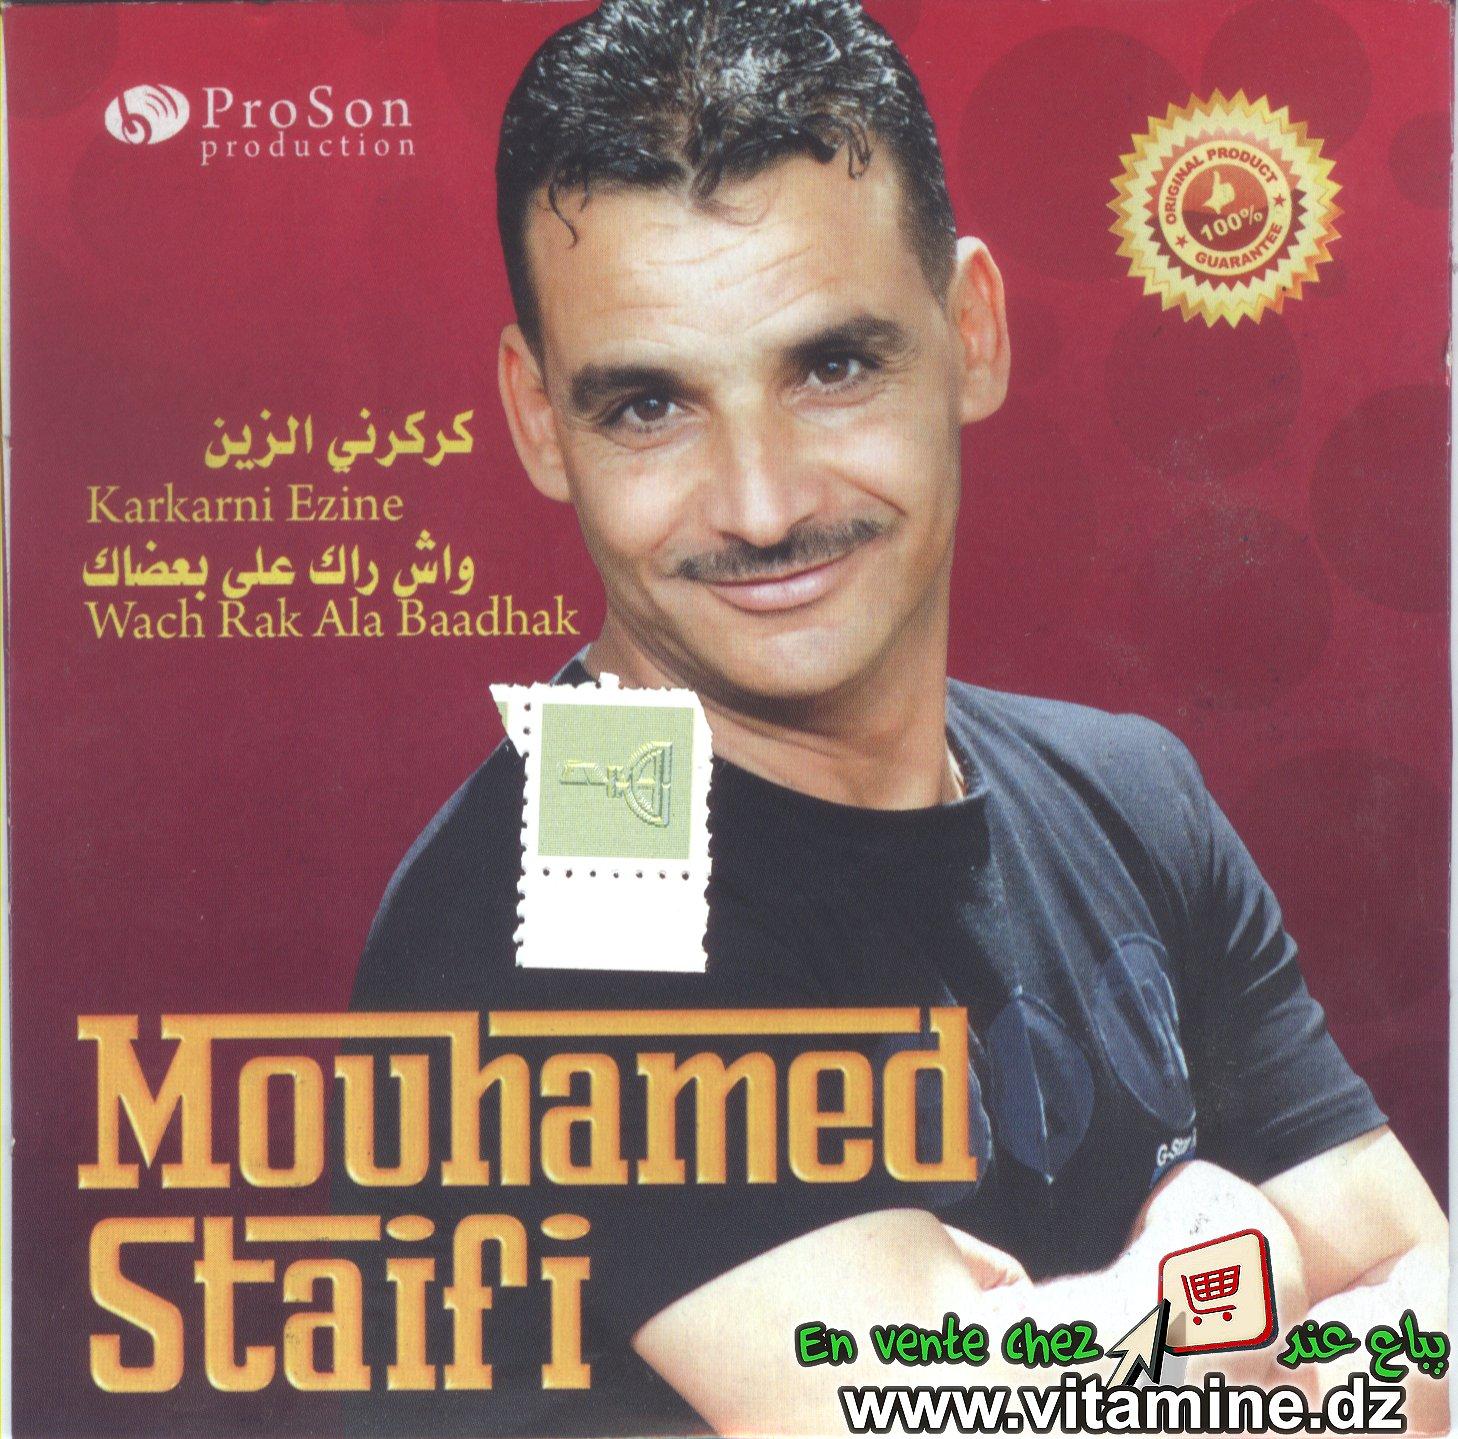 Mouhamed Staifi - karkarni ezzine